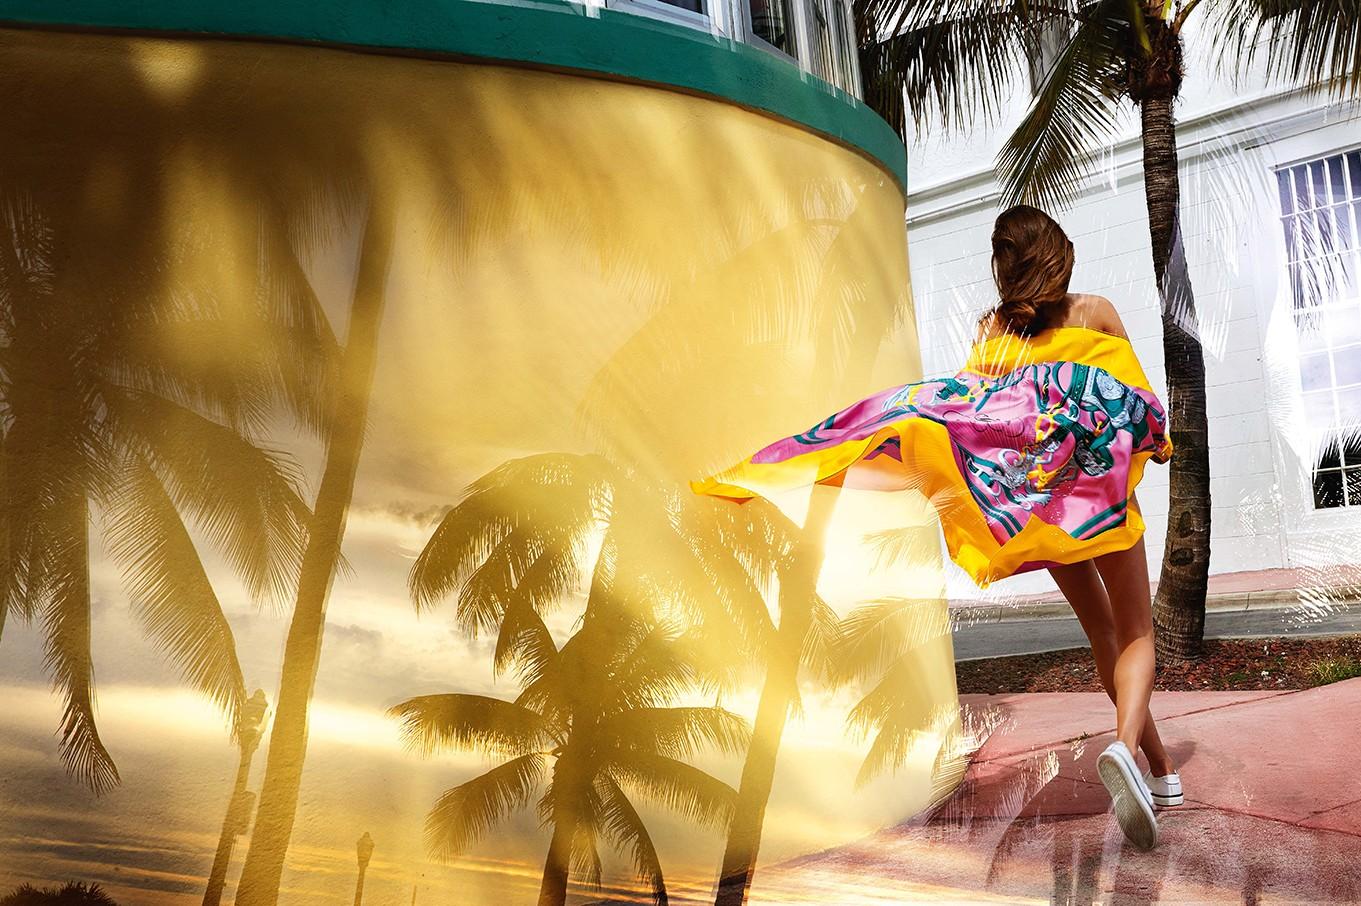 Hermès 2015年将仅新开三家门店,调价?今年别想!